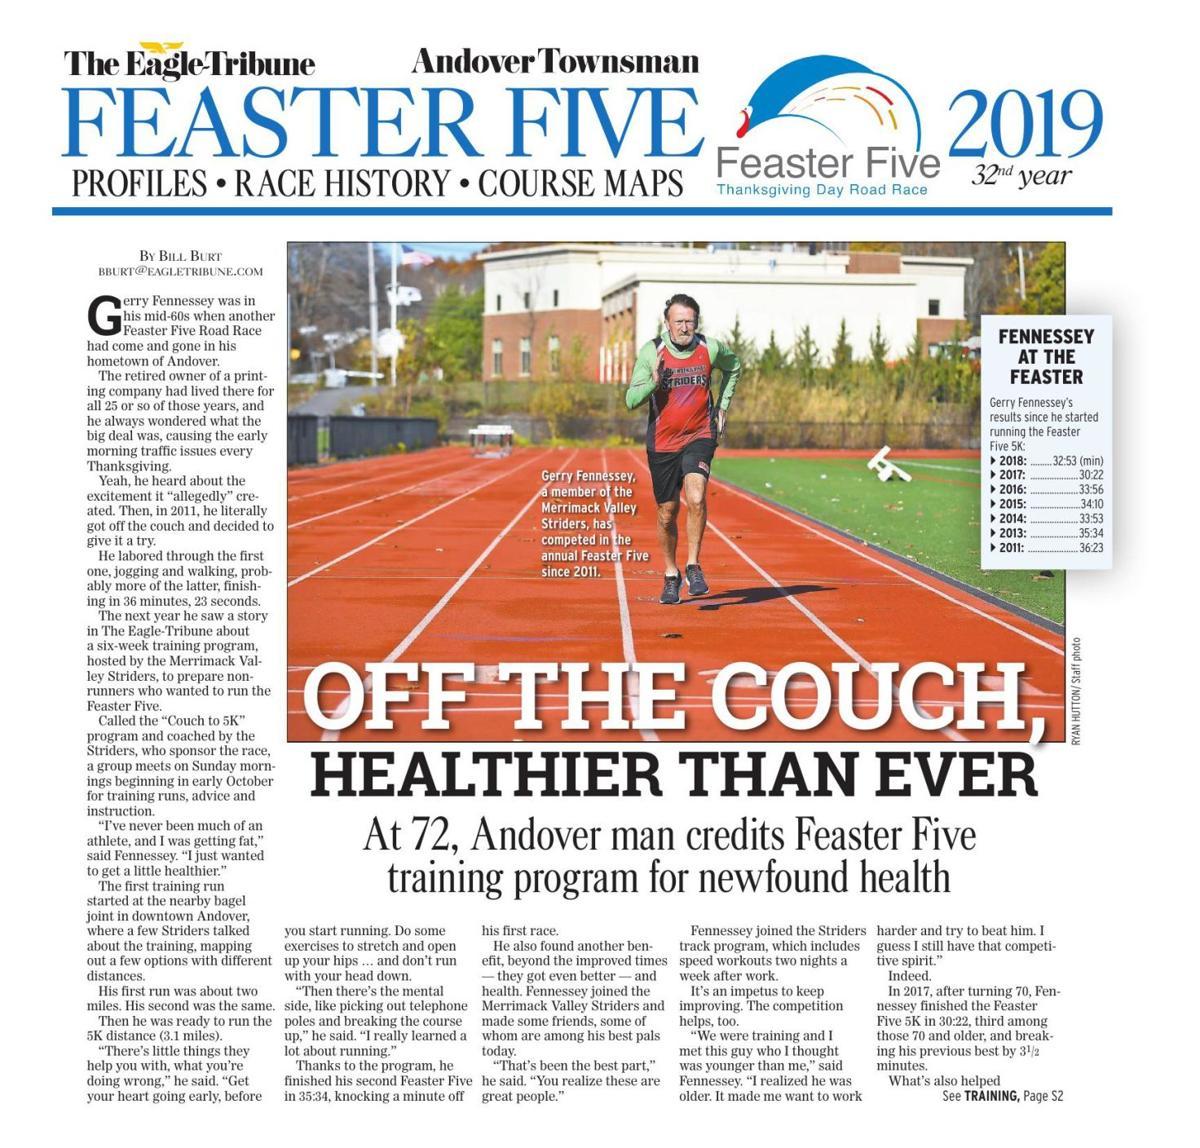 Feaster Five 2019